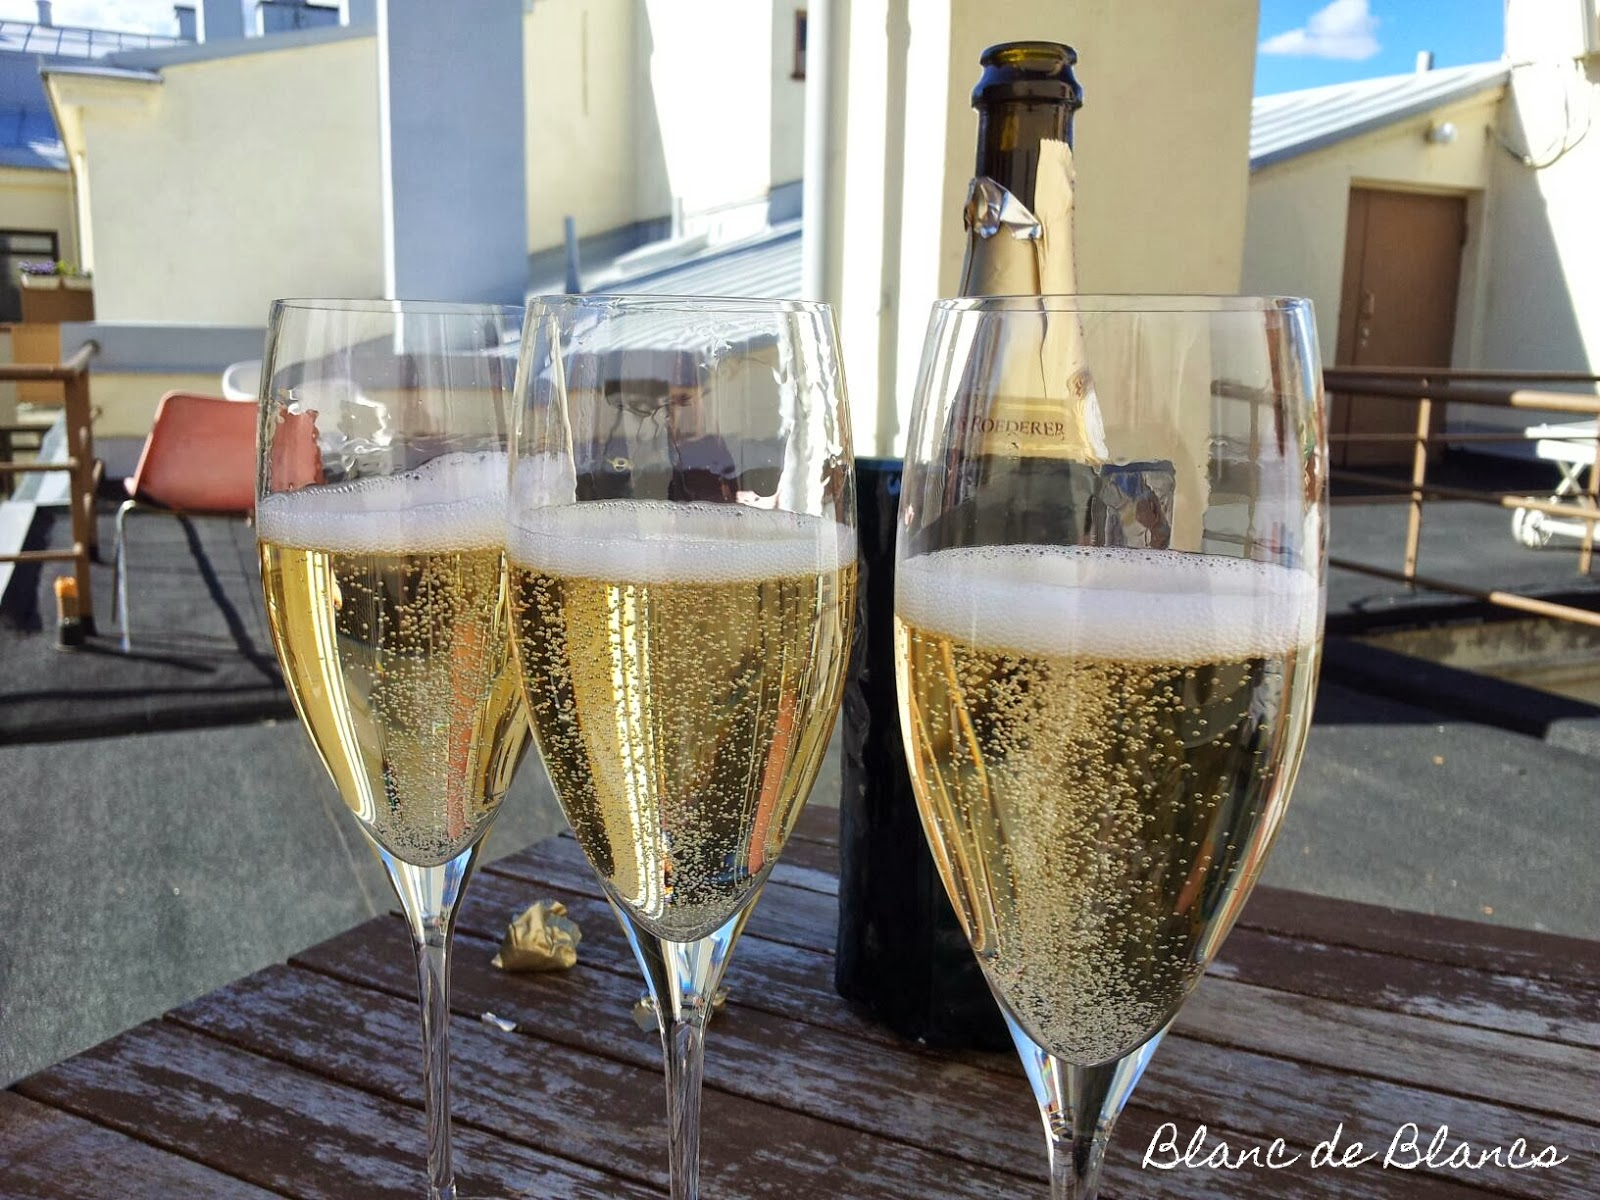 Blanc de Blancs 3 vuotta -malja Joseph Perrier Champagne - Blanc de Blancs